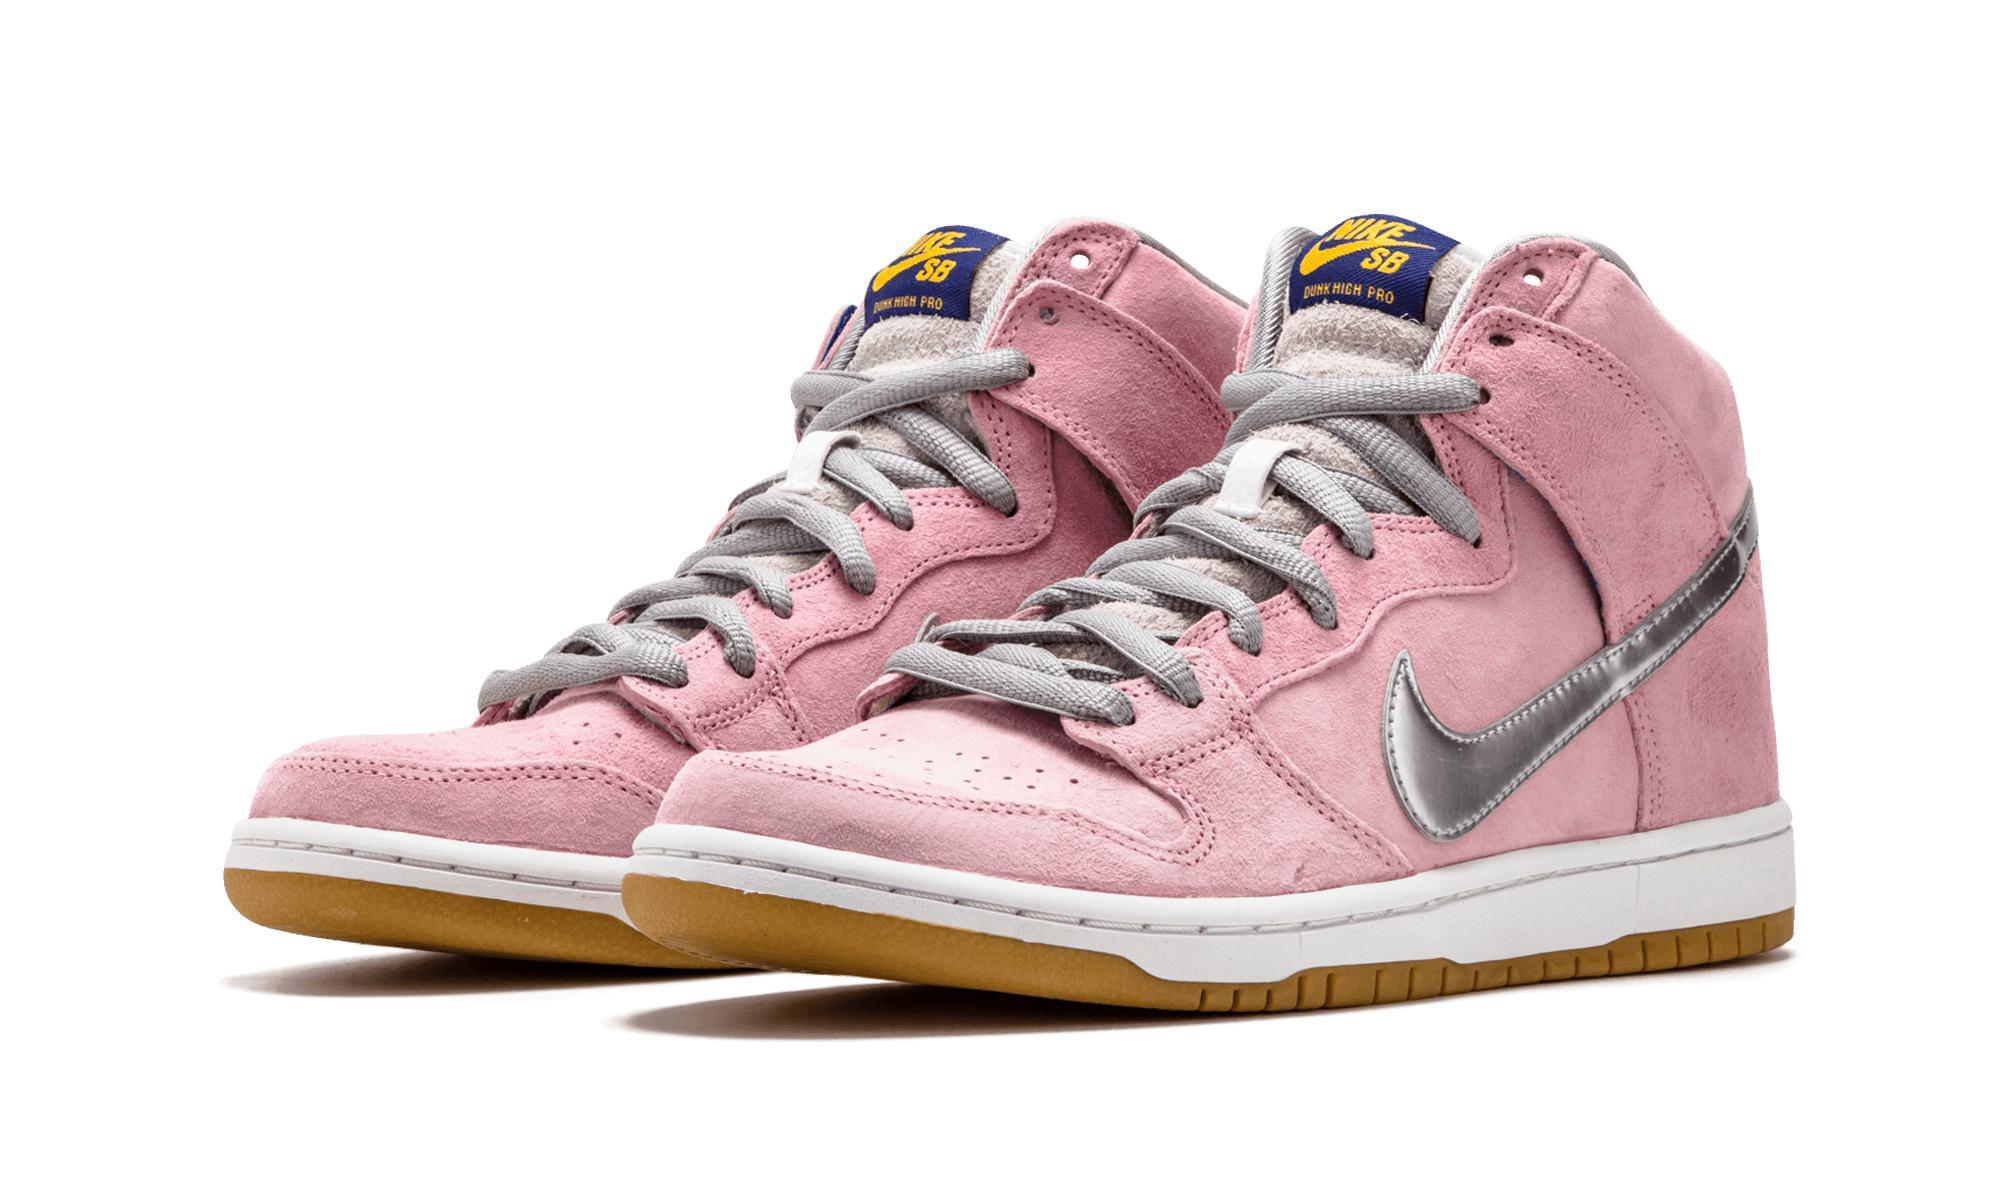 buy popular 00cbd 9bfa9 Lyst - Nike Dunk High Pro Premium Sb in Pink for Men